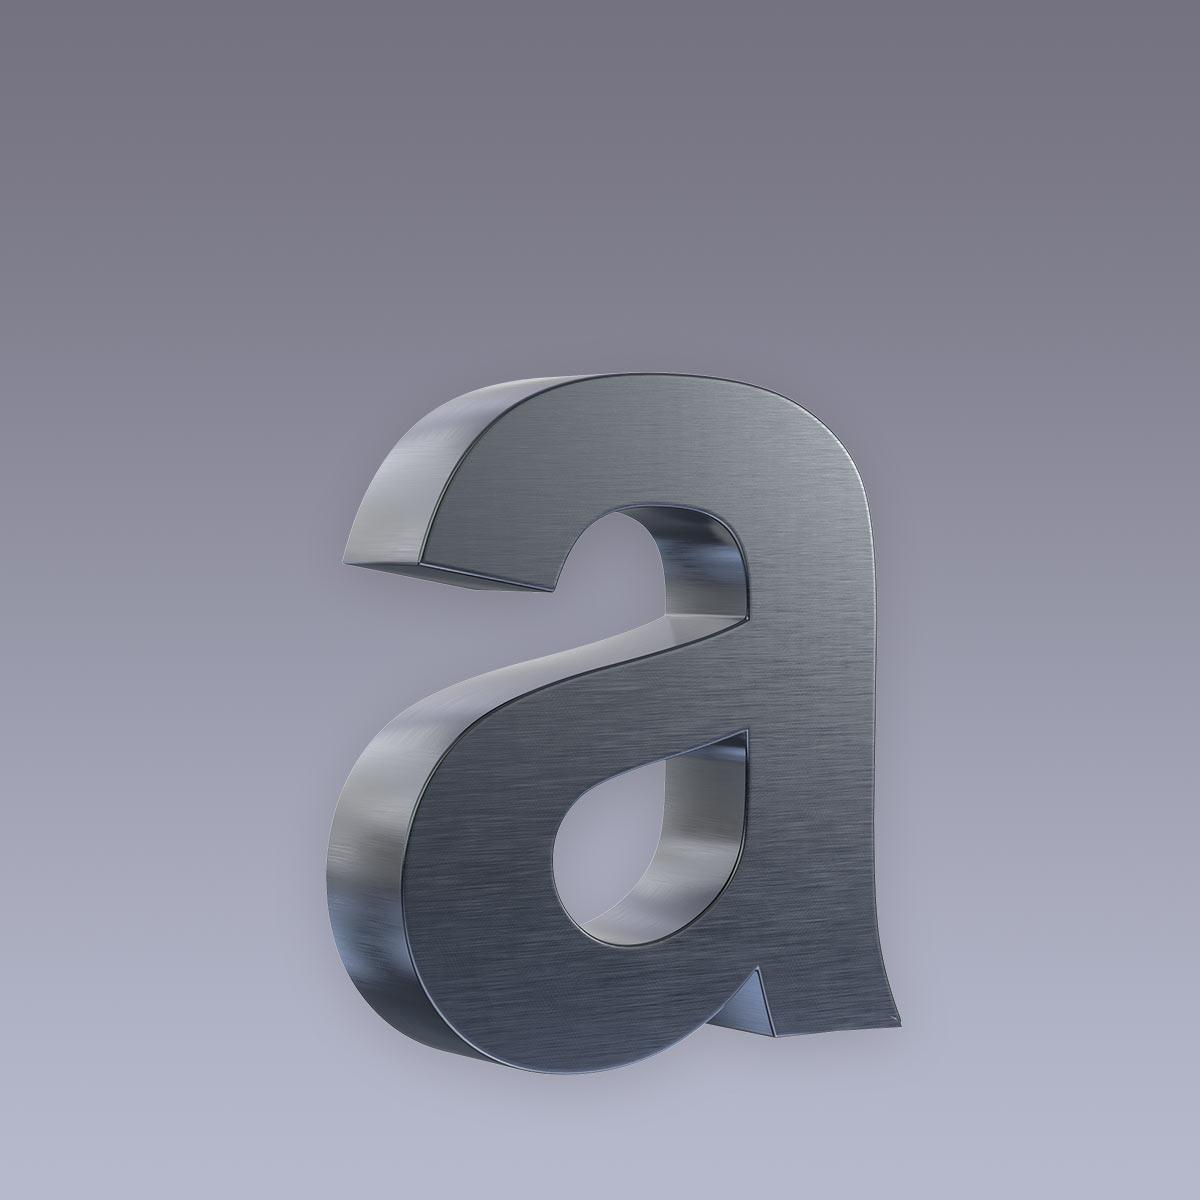 3D Hausnummer a Edelstahl anthrazit RAL7016 in 3D Design Arial